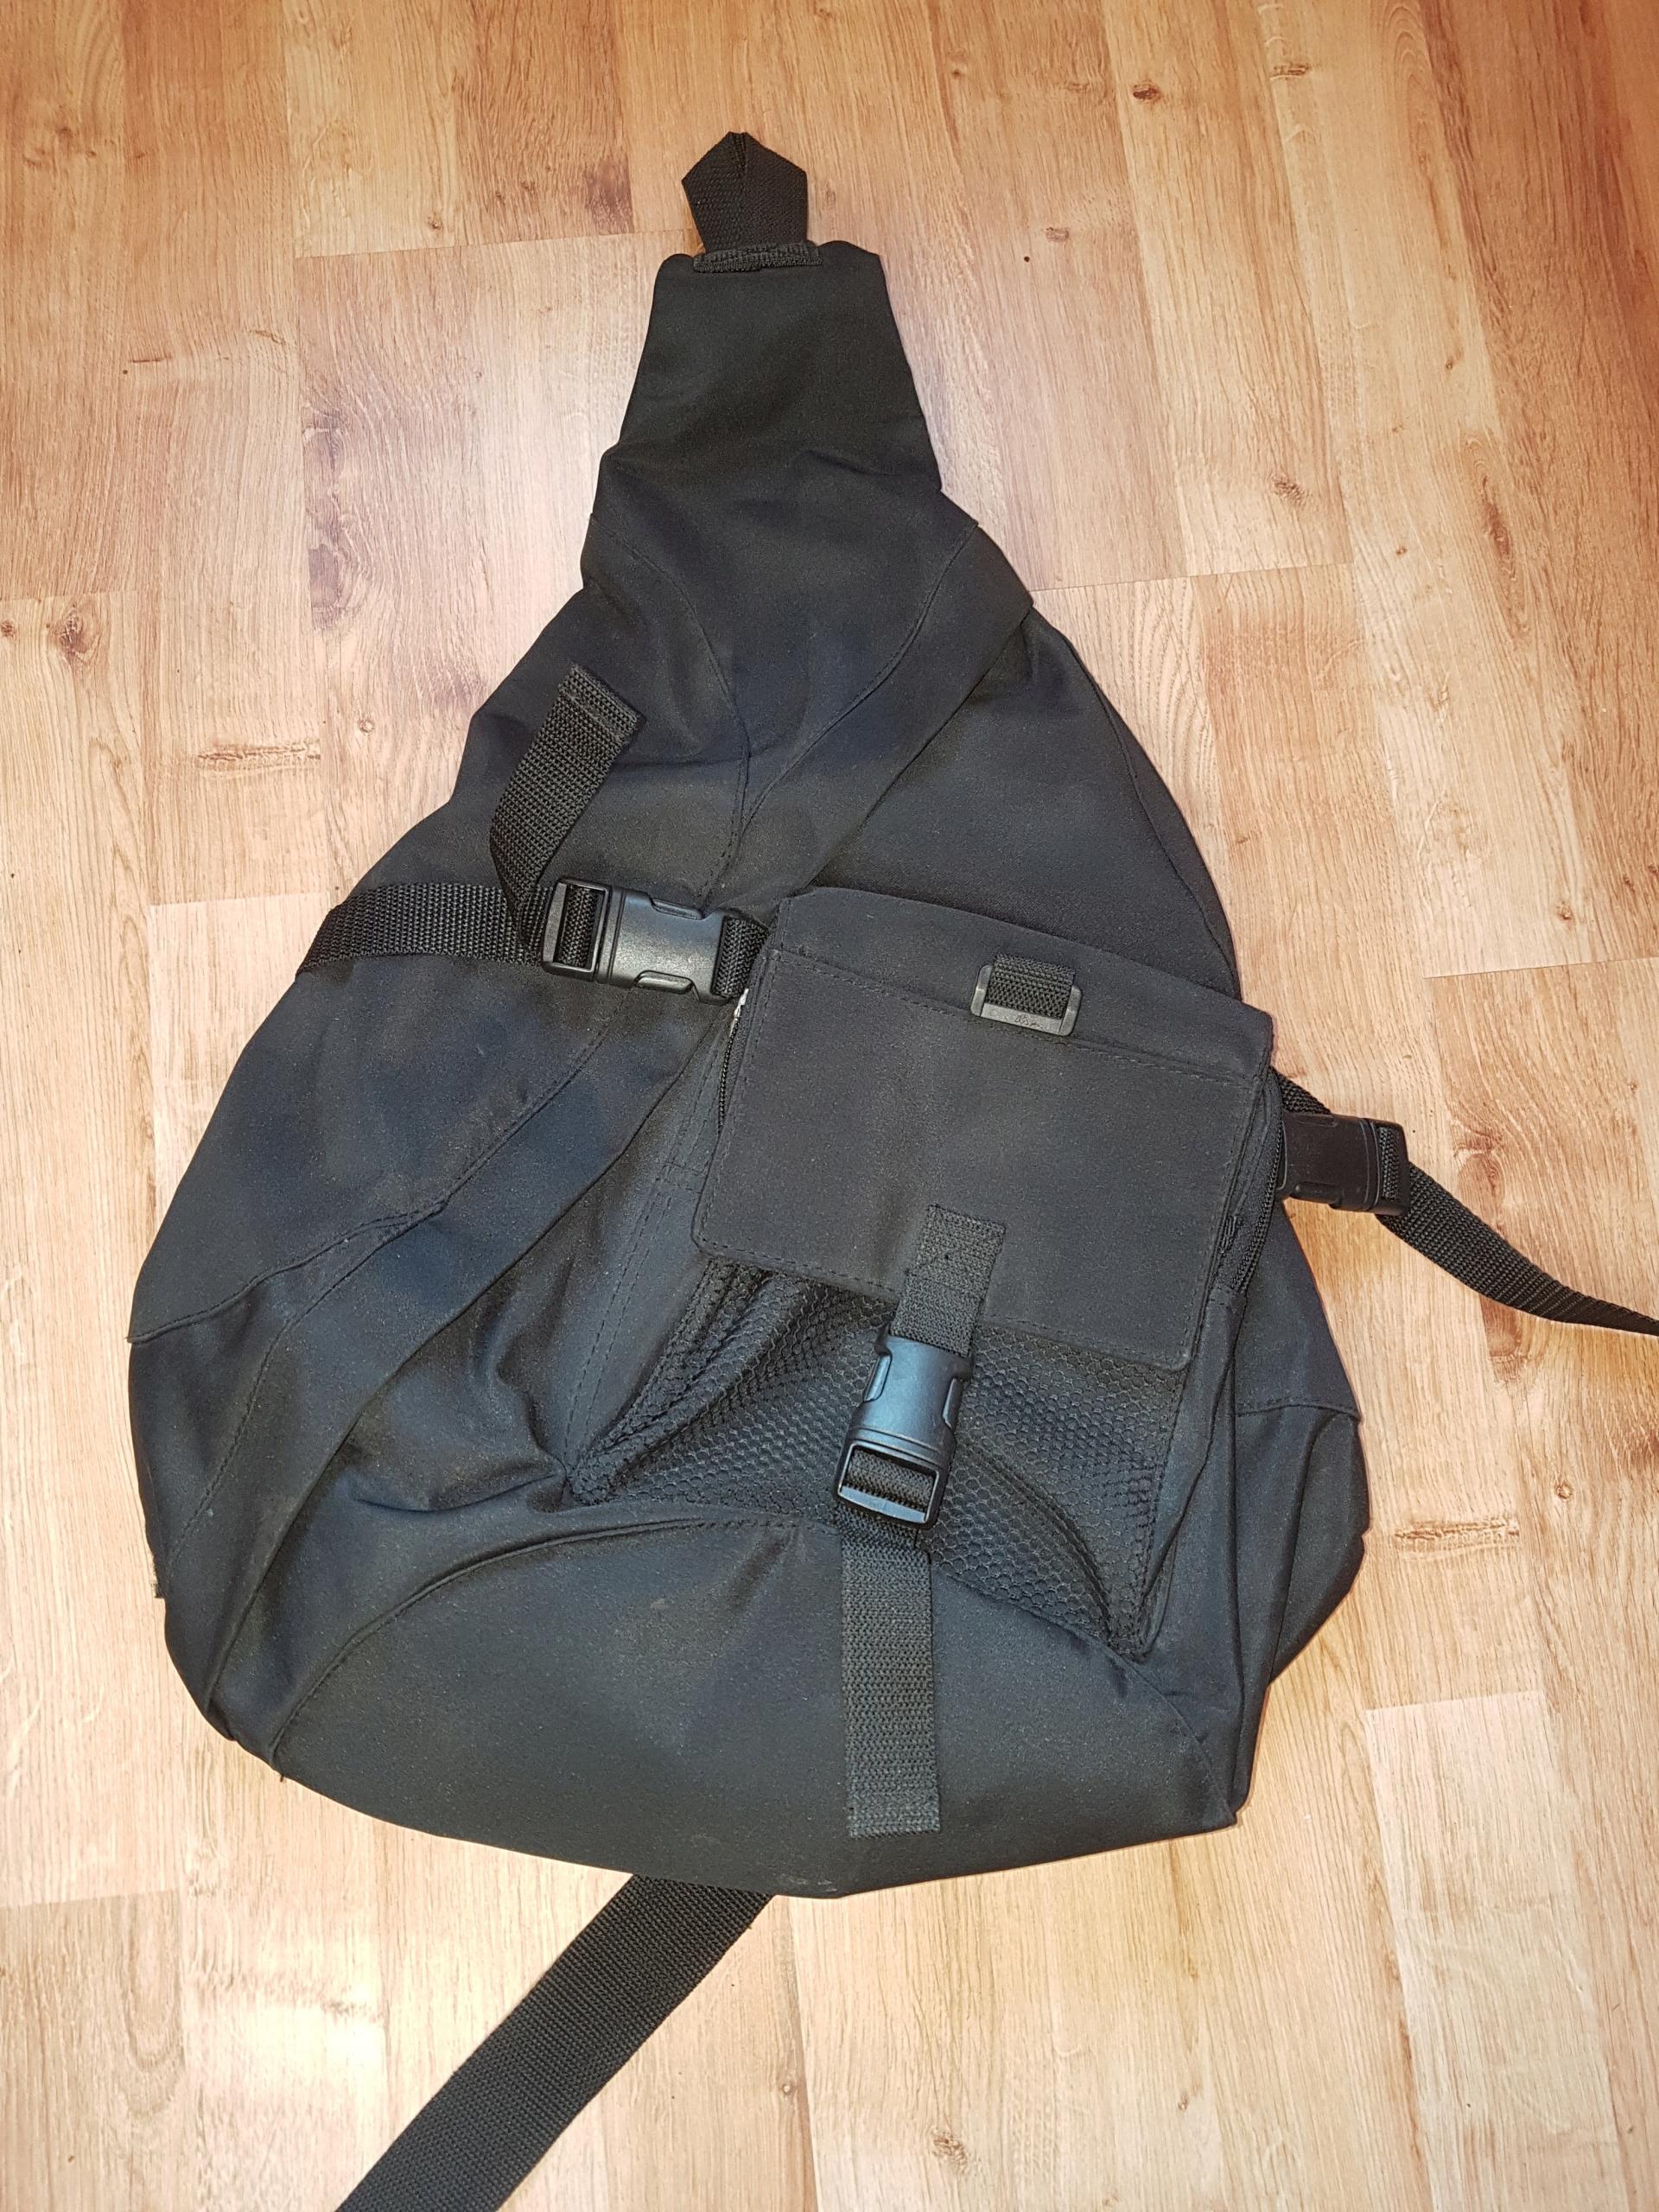 Plecak na jedno ramię czarny 56 cm